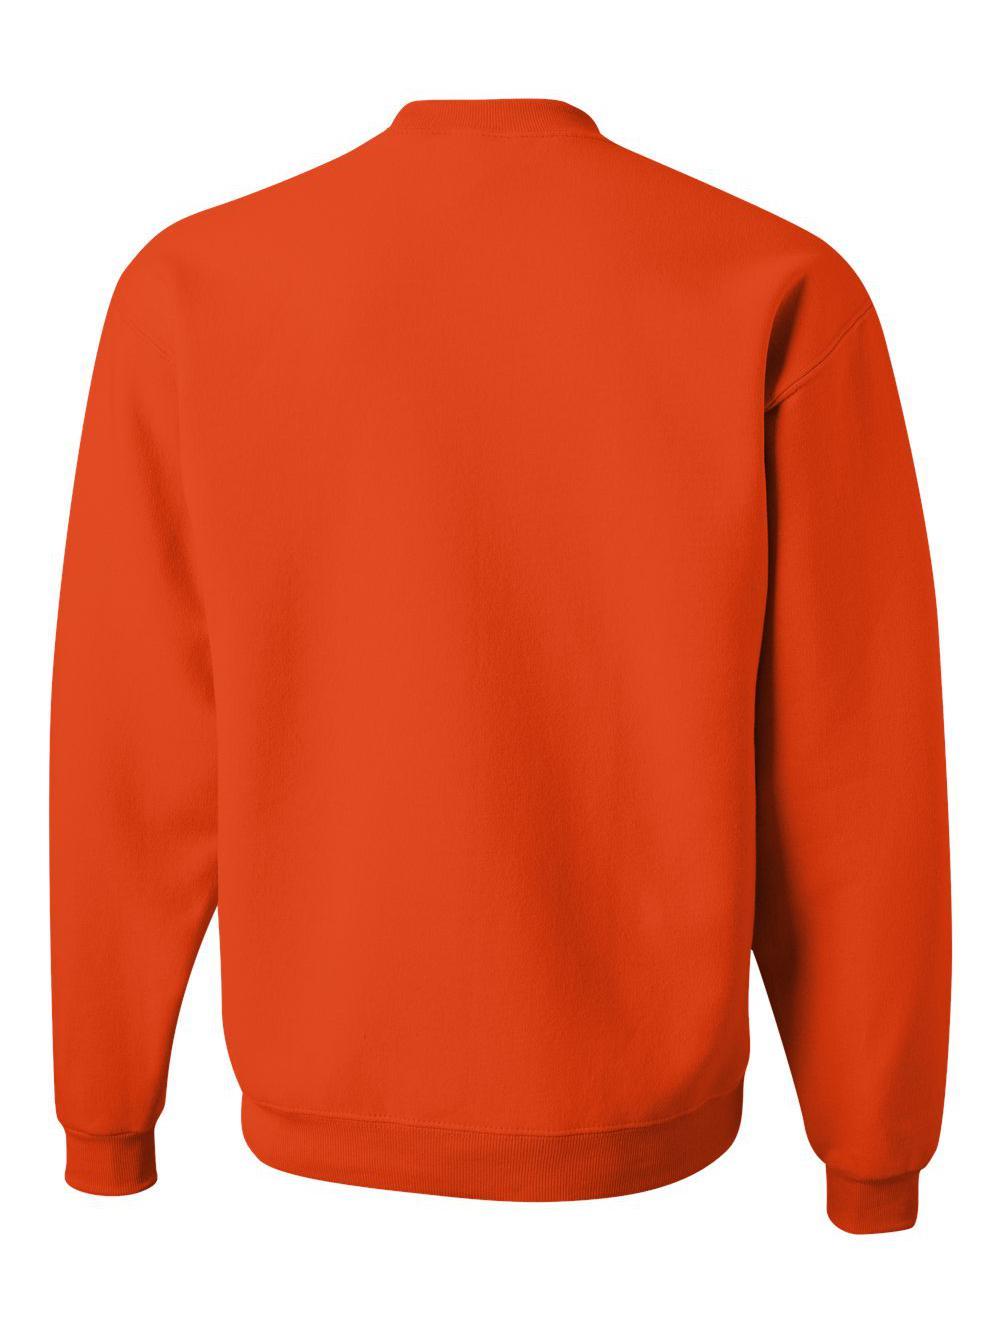 Jerzees-NuBlend-Crewneck-Sweatshirt-562MR thumbnail 16